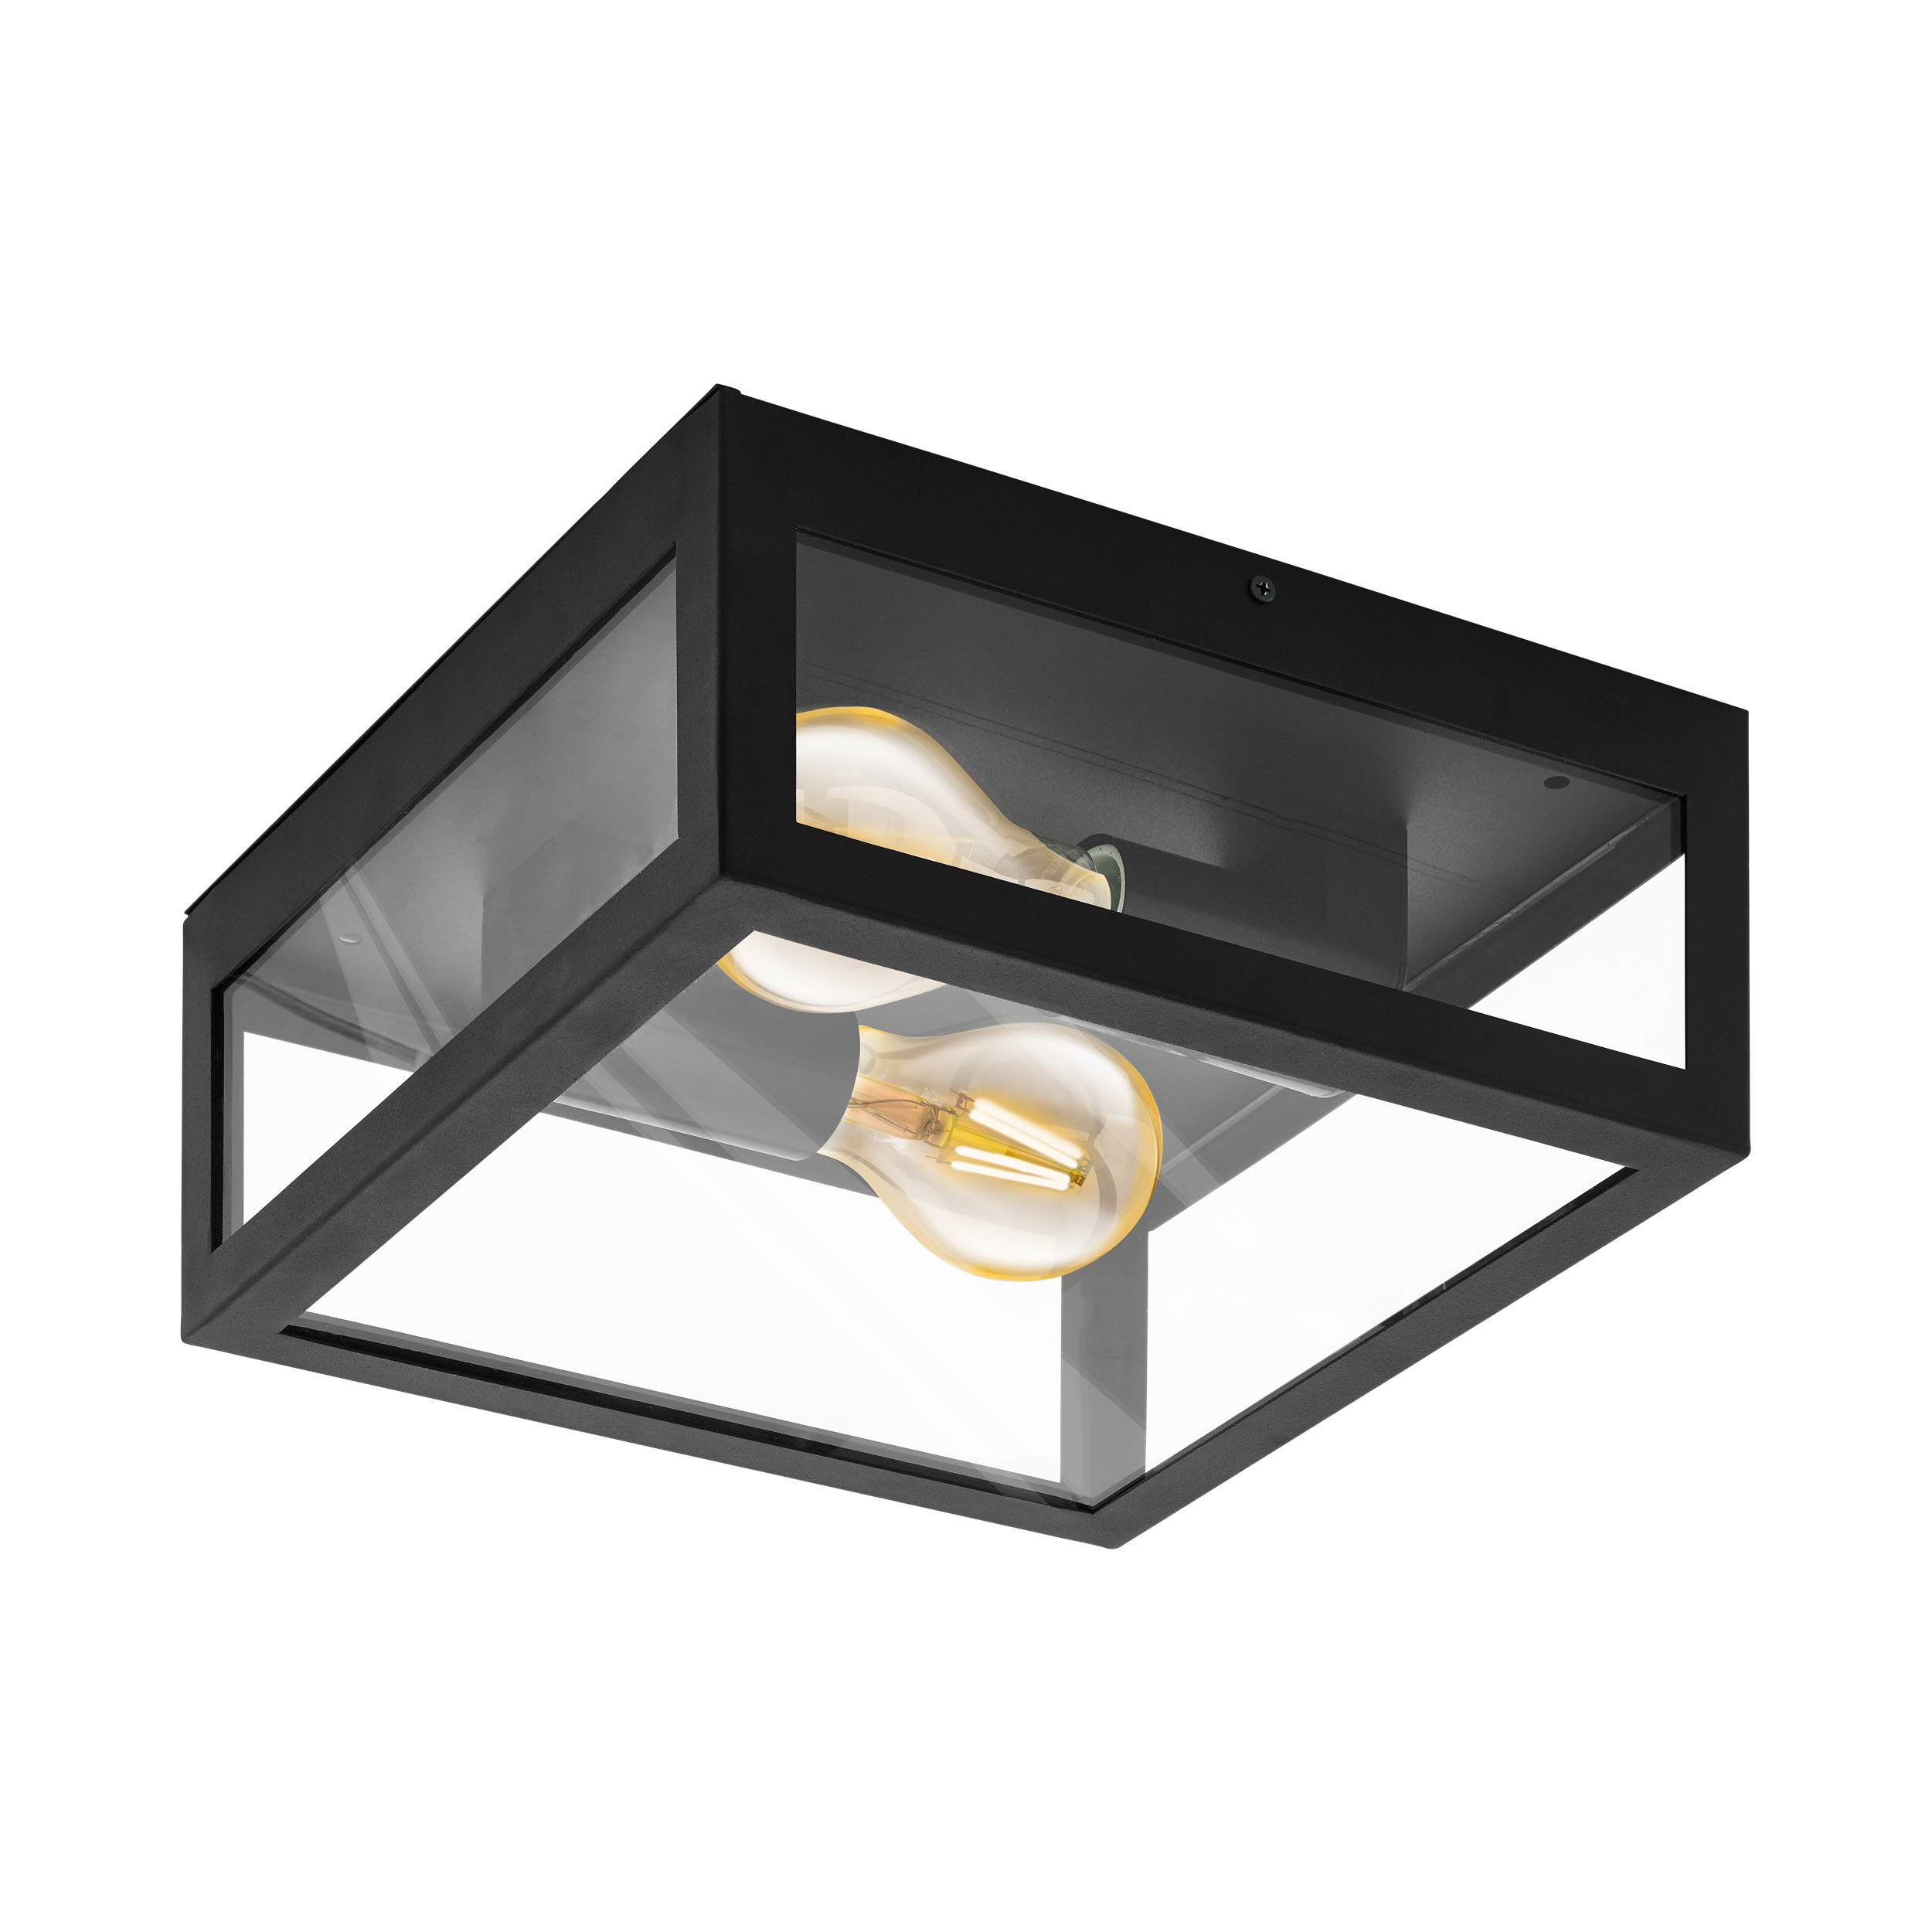 Wandlamp/plafondlamp alamonte 1 zwart-glas 2xE27